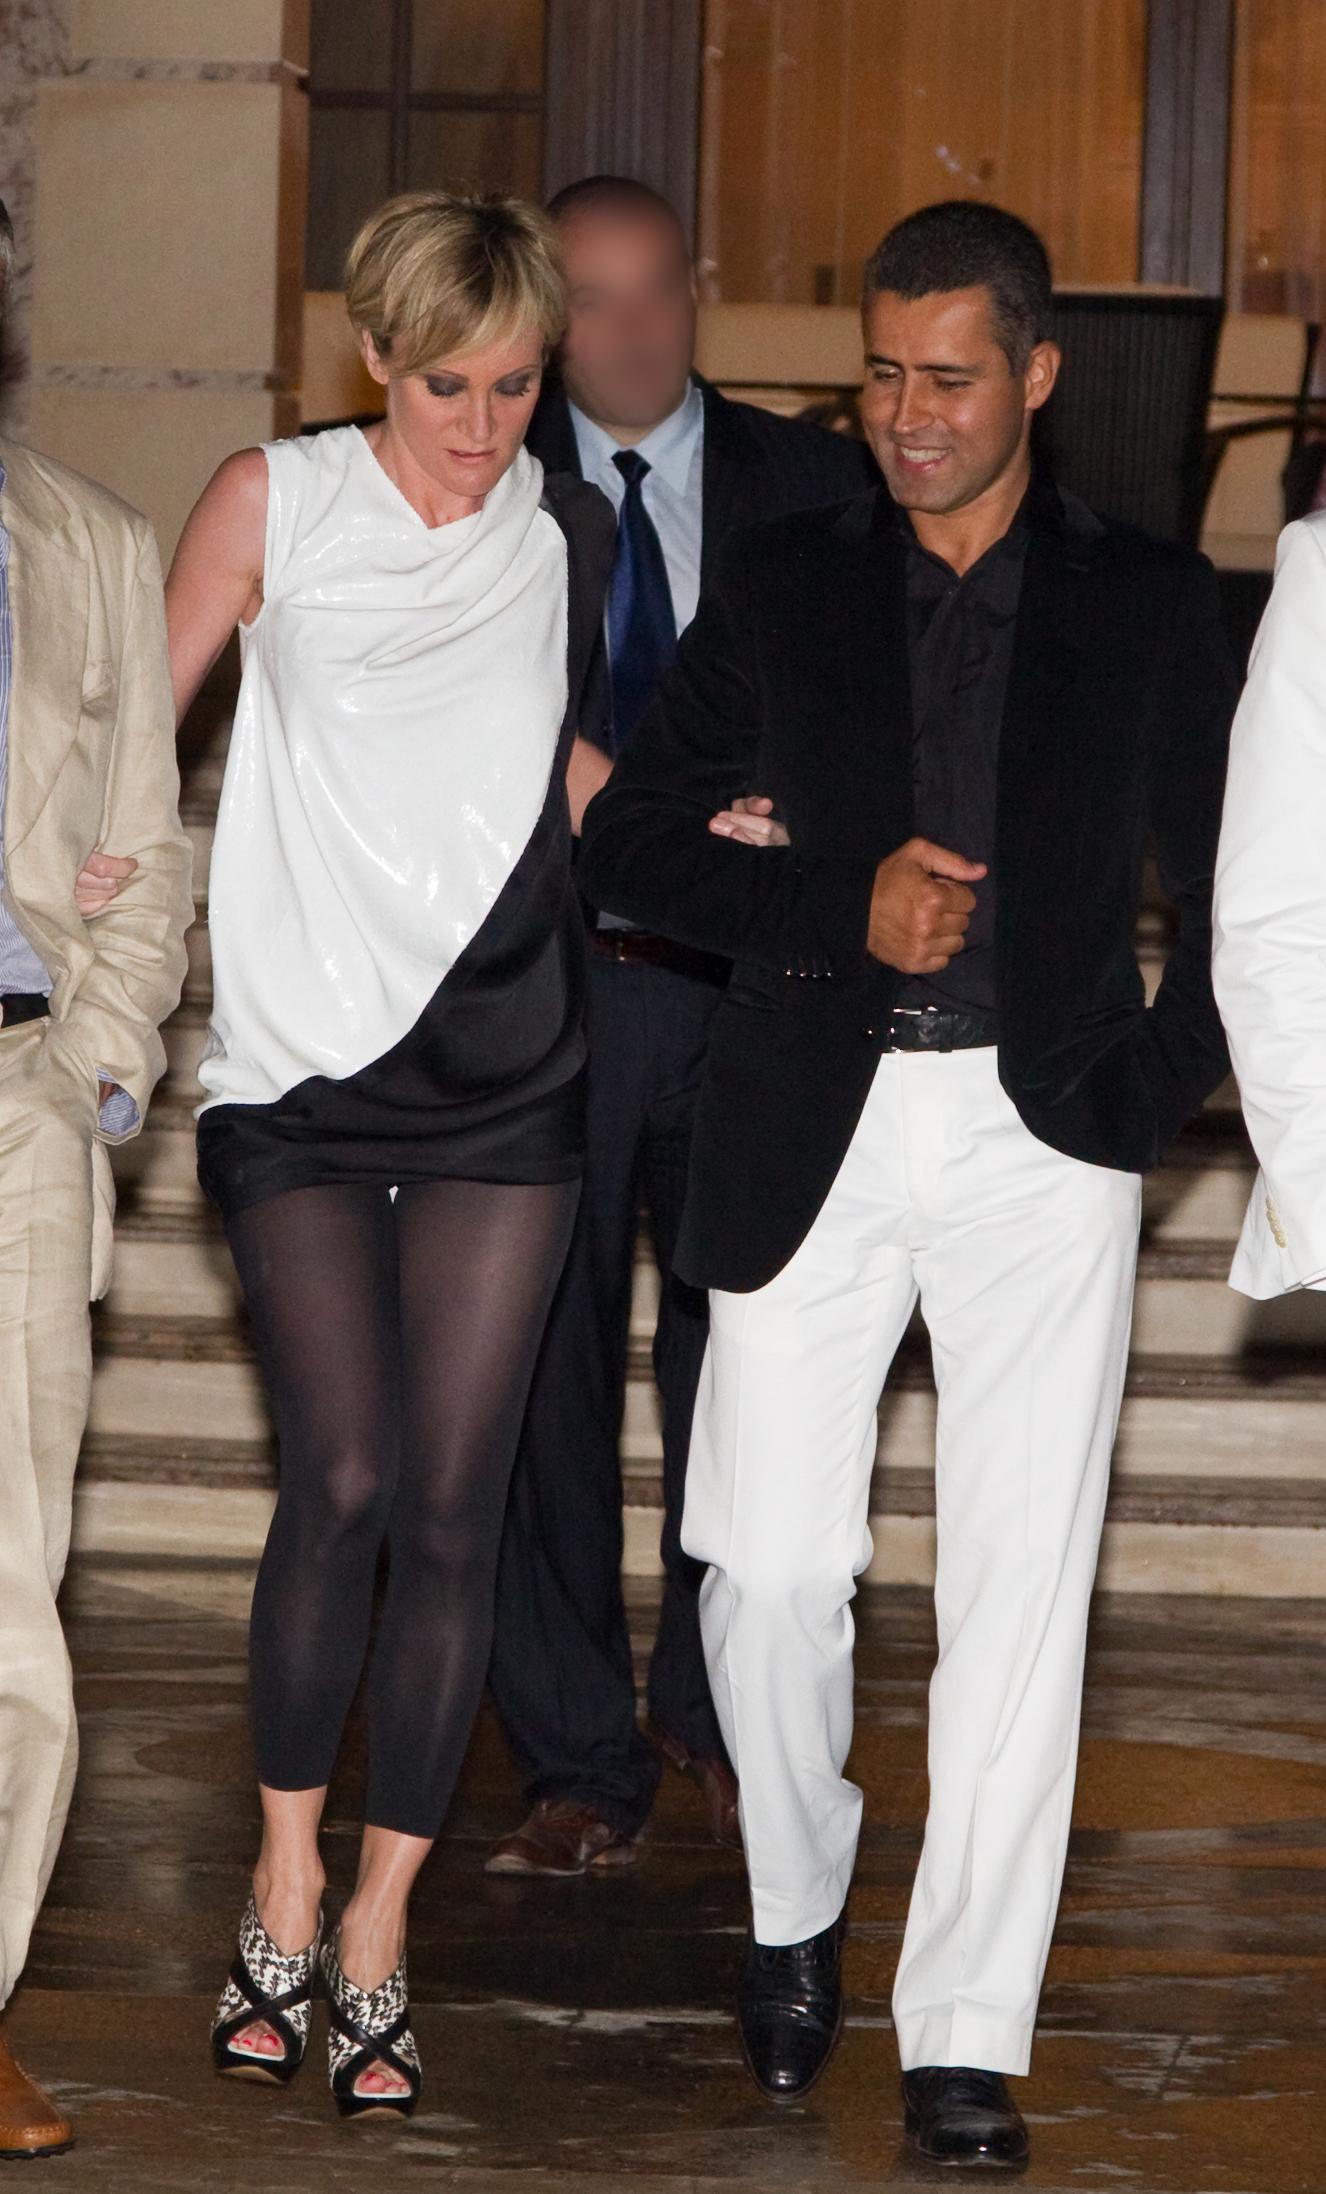 Imagine Q_Magazine. Patricia i-a cantat lui Remus Truica de ziua lui, in 2010, la petrecerea faraonica data de milionar la resedinta sa de la Snagov